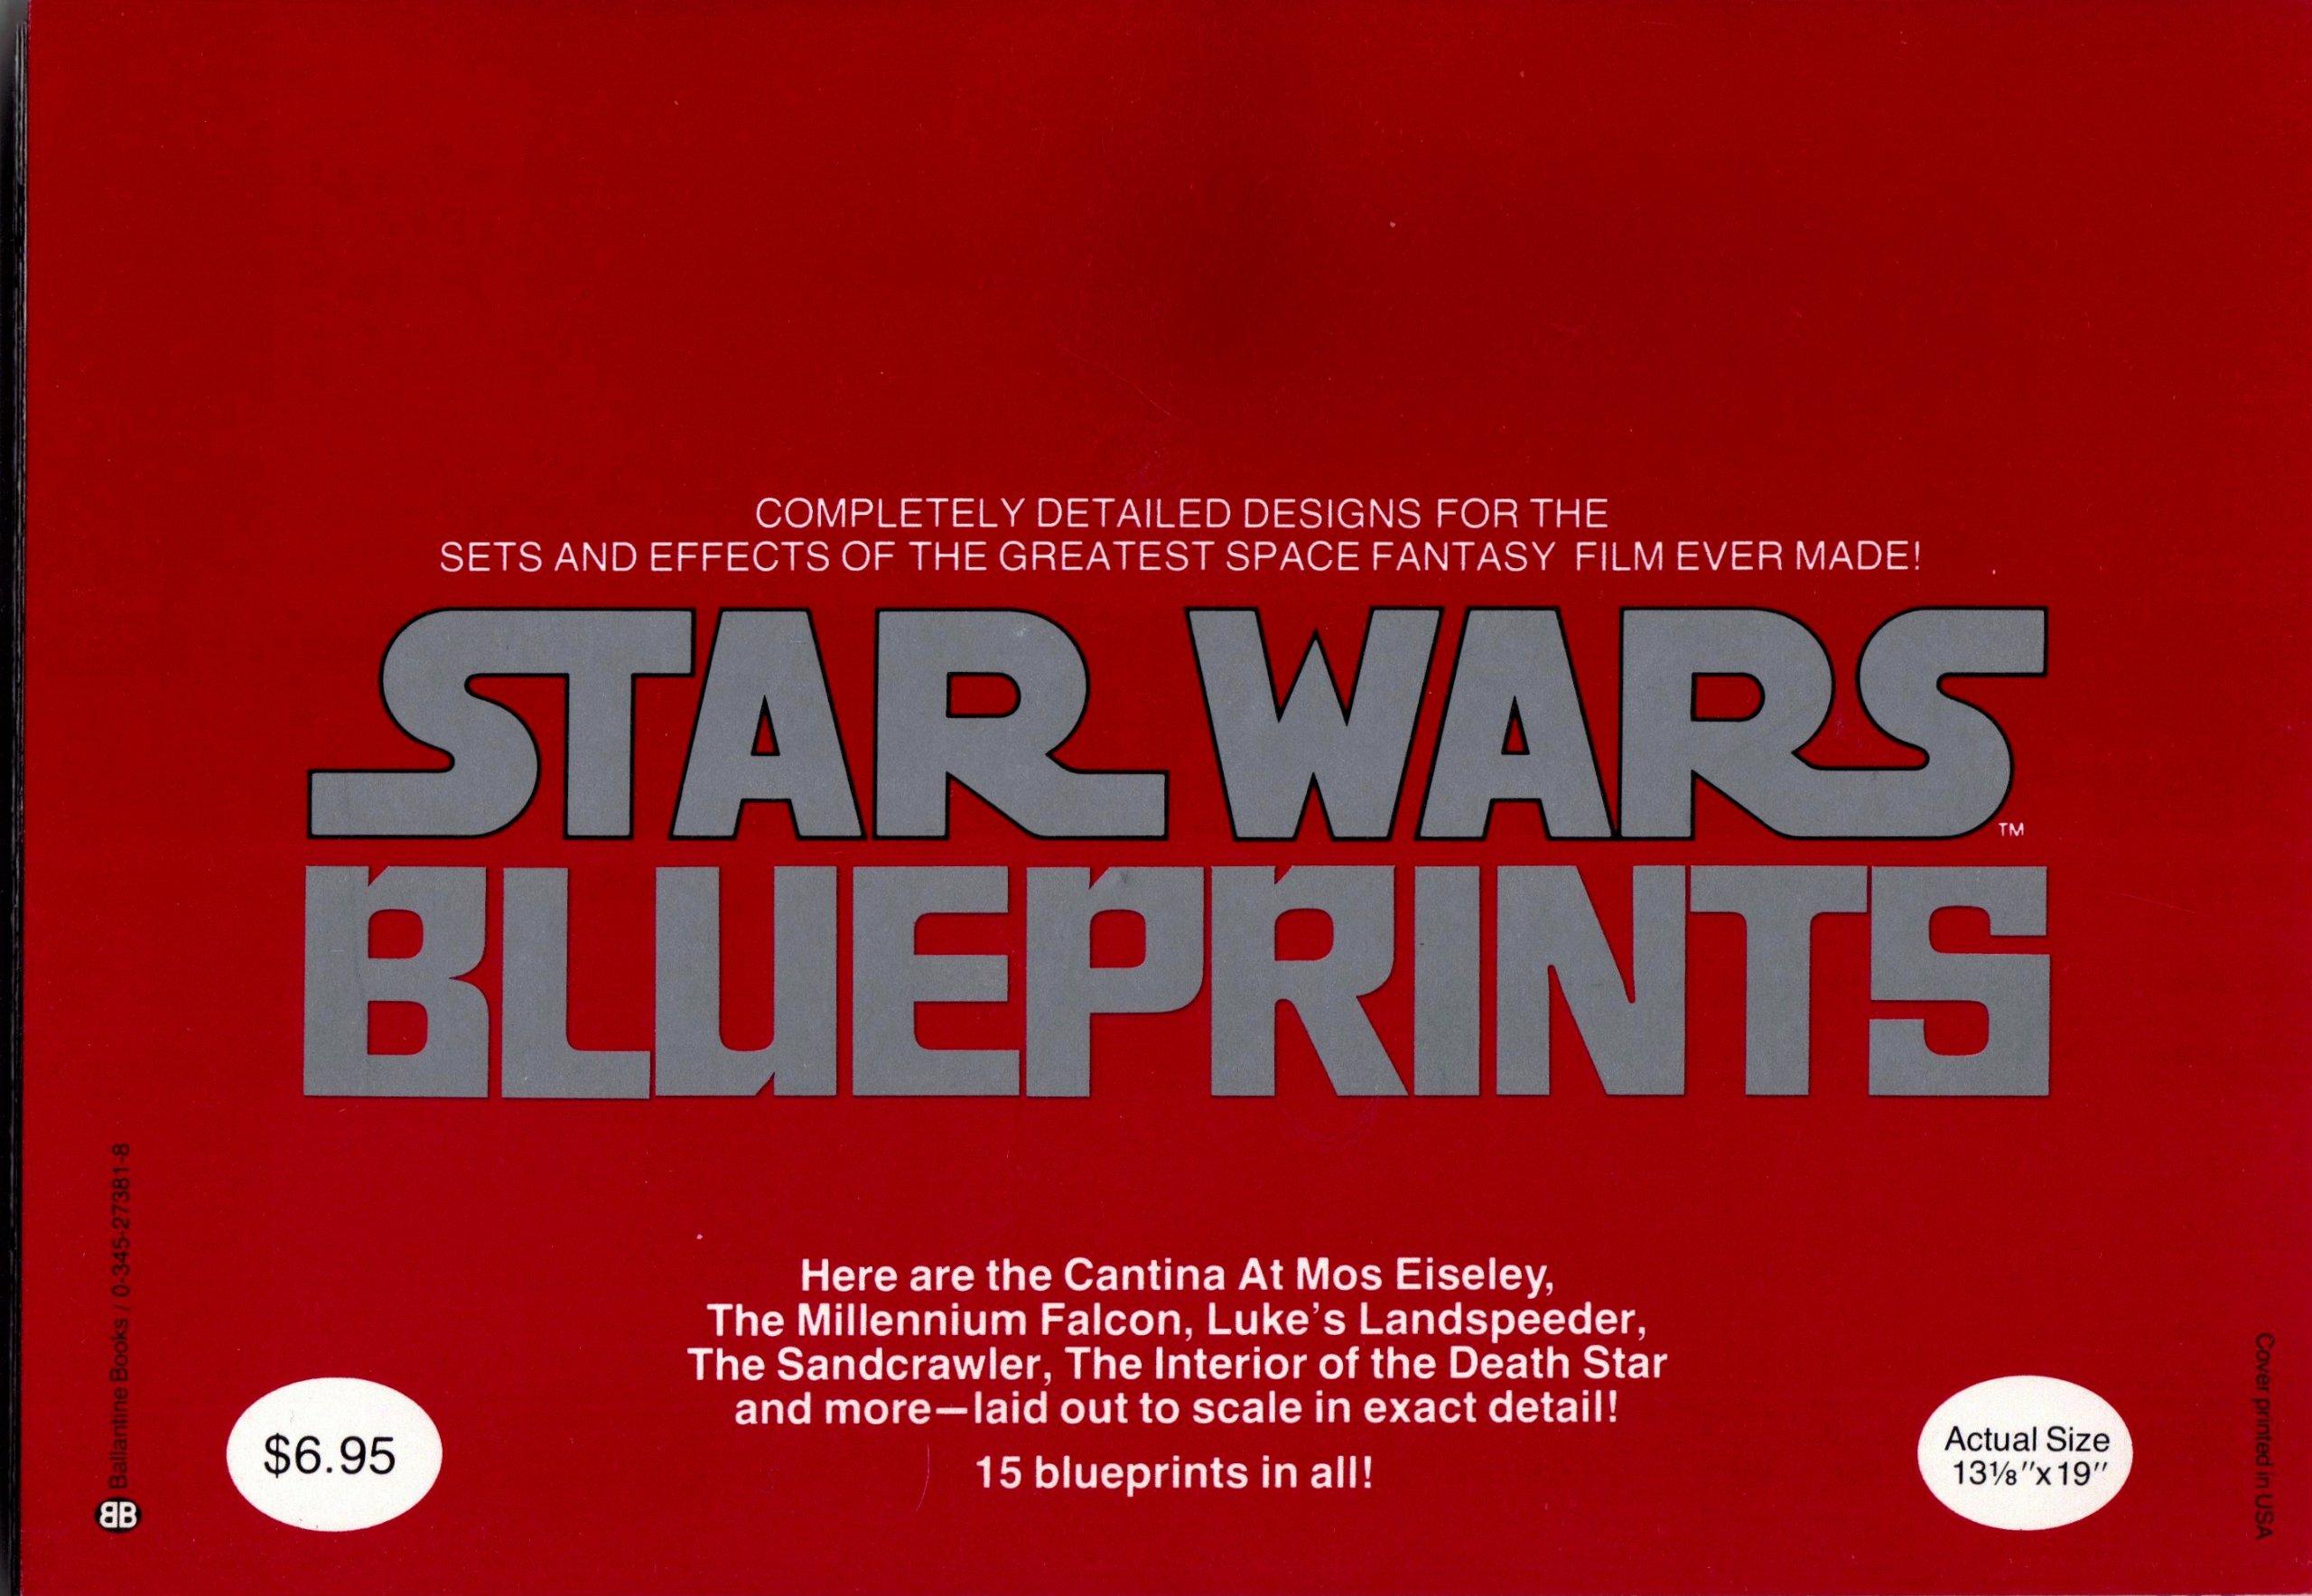 Star wars blueprints lucas film editors 9780345273819 amazon star wars blueprints lucas film editors 9780345273819 amazon books malvernweather Image collections